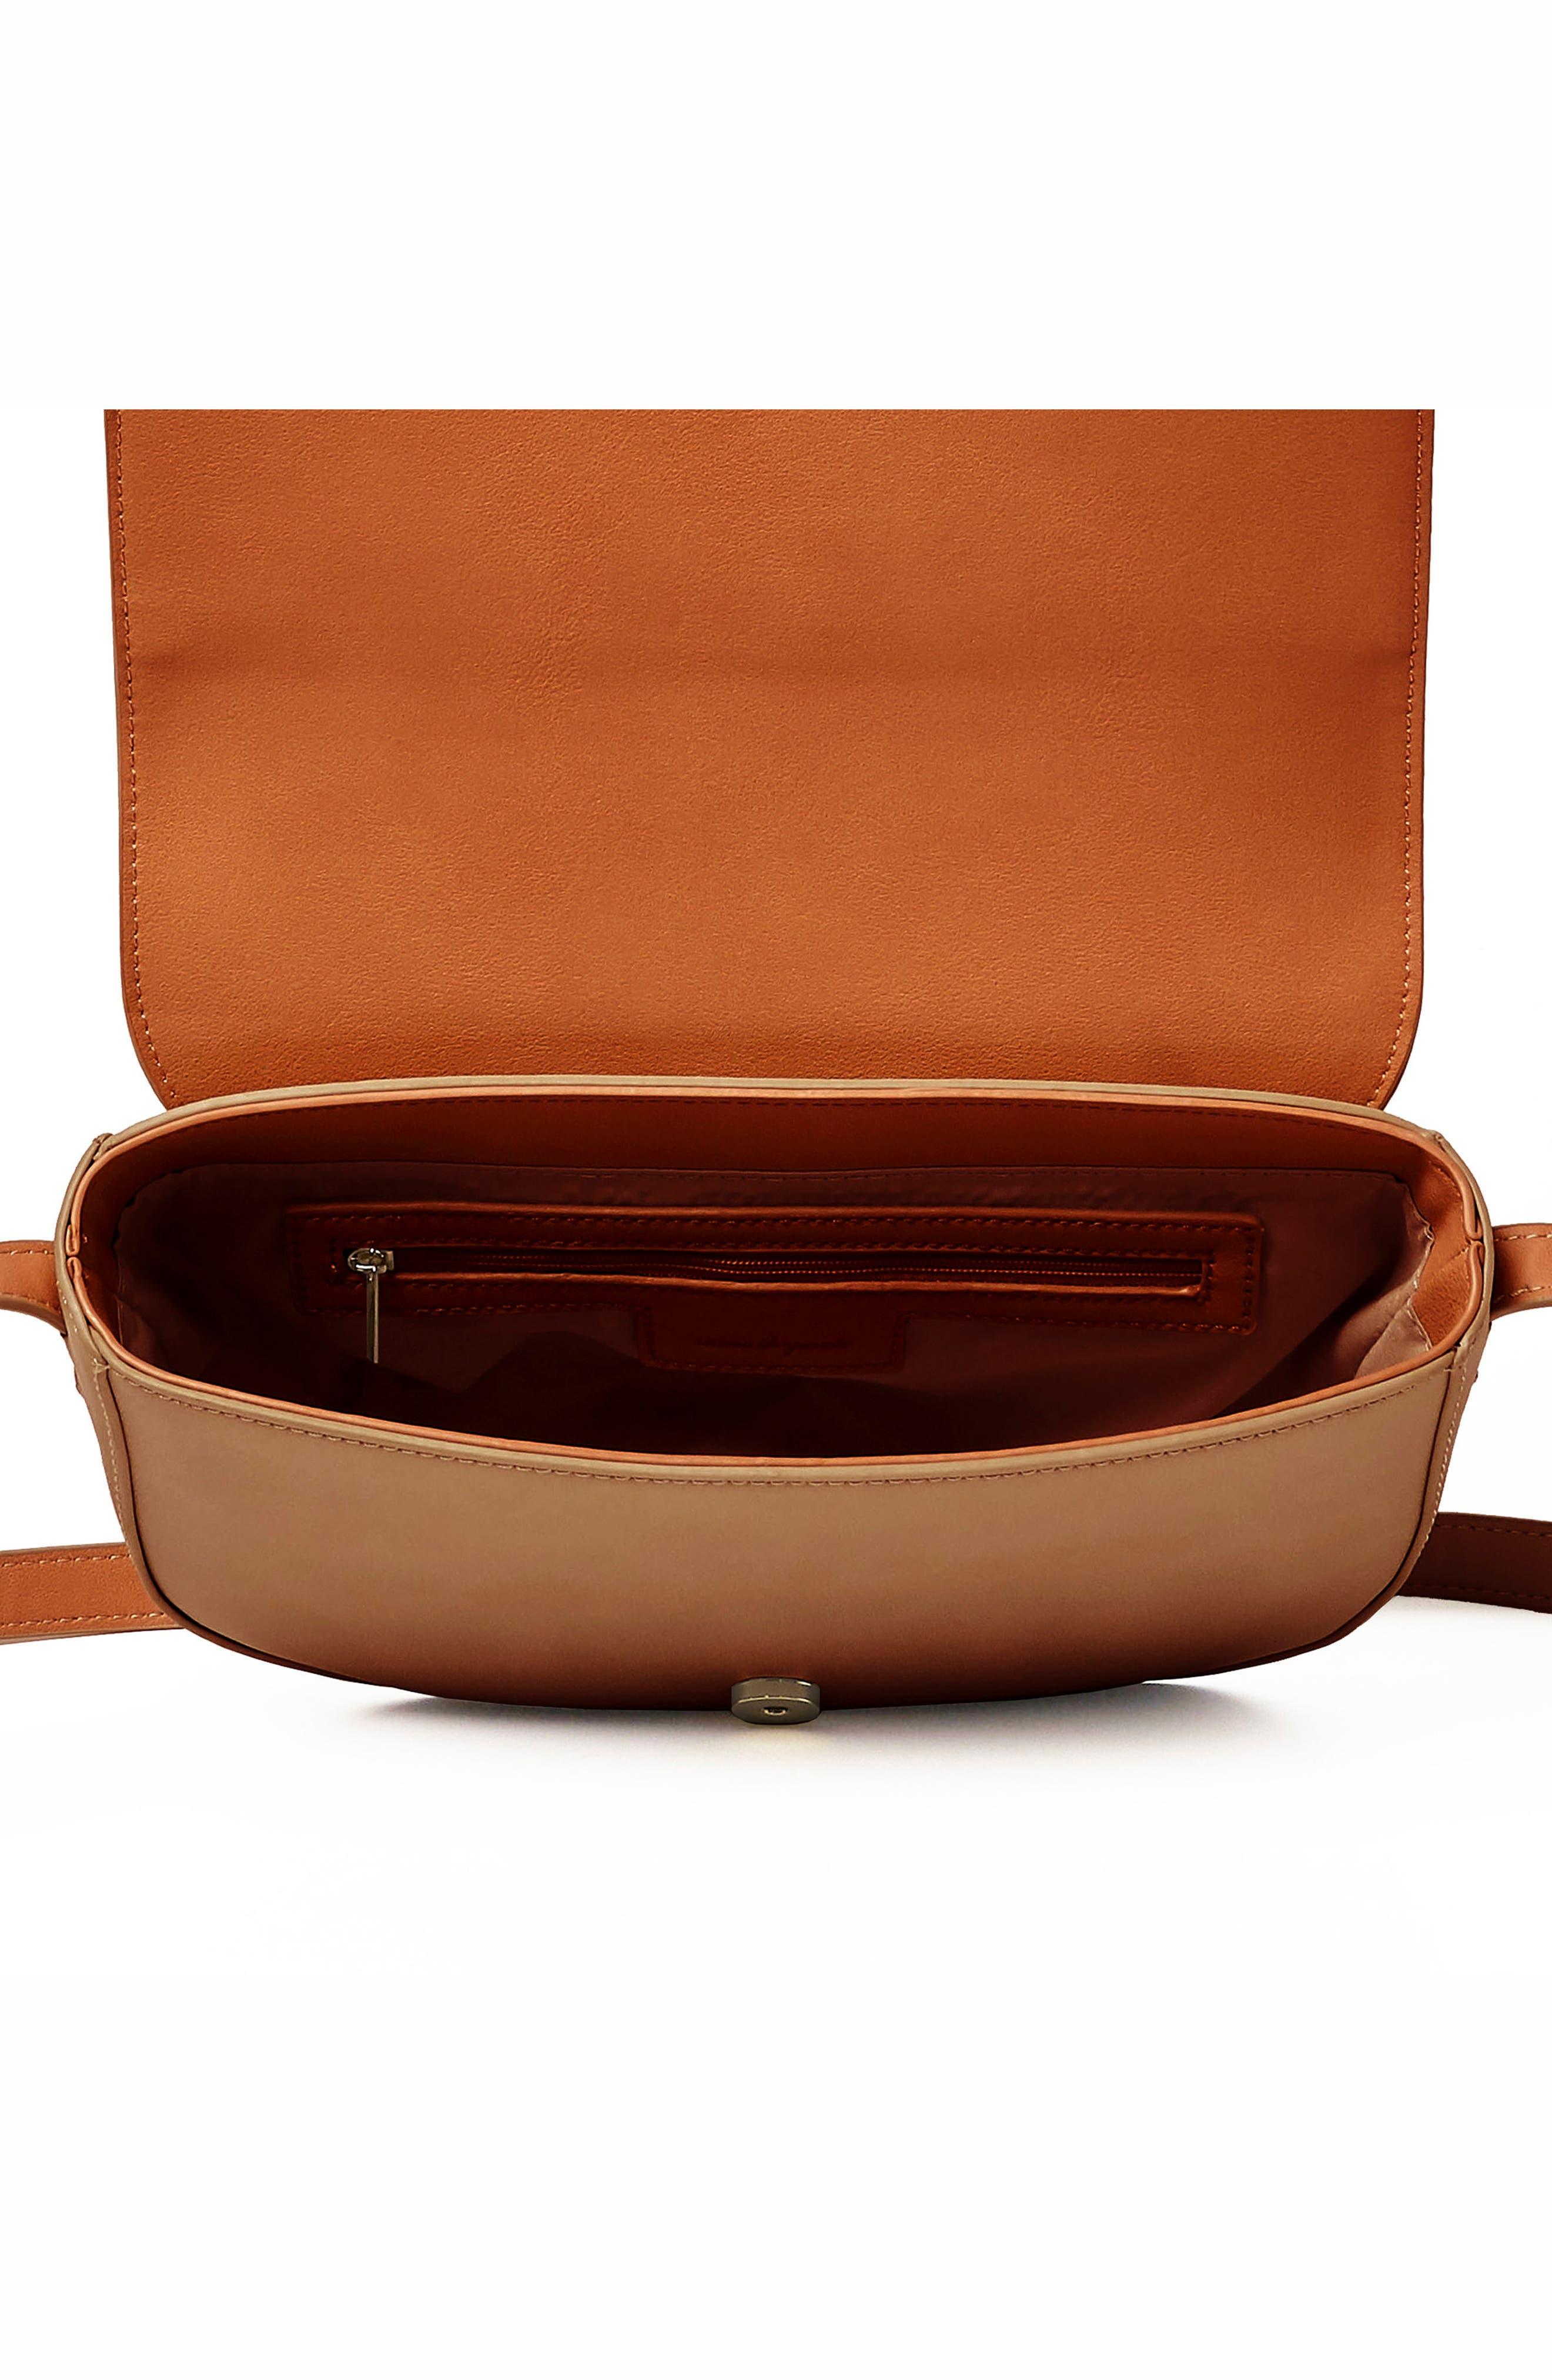 Lolita Vegan Leather Crossbody Bag,                             Alternate thumbnail 2, color,                             CAMEL